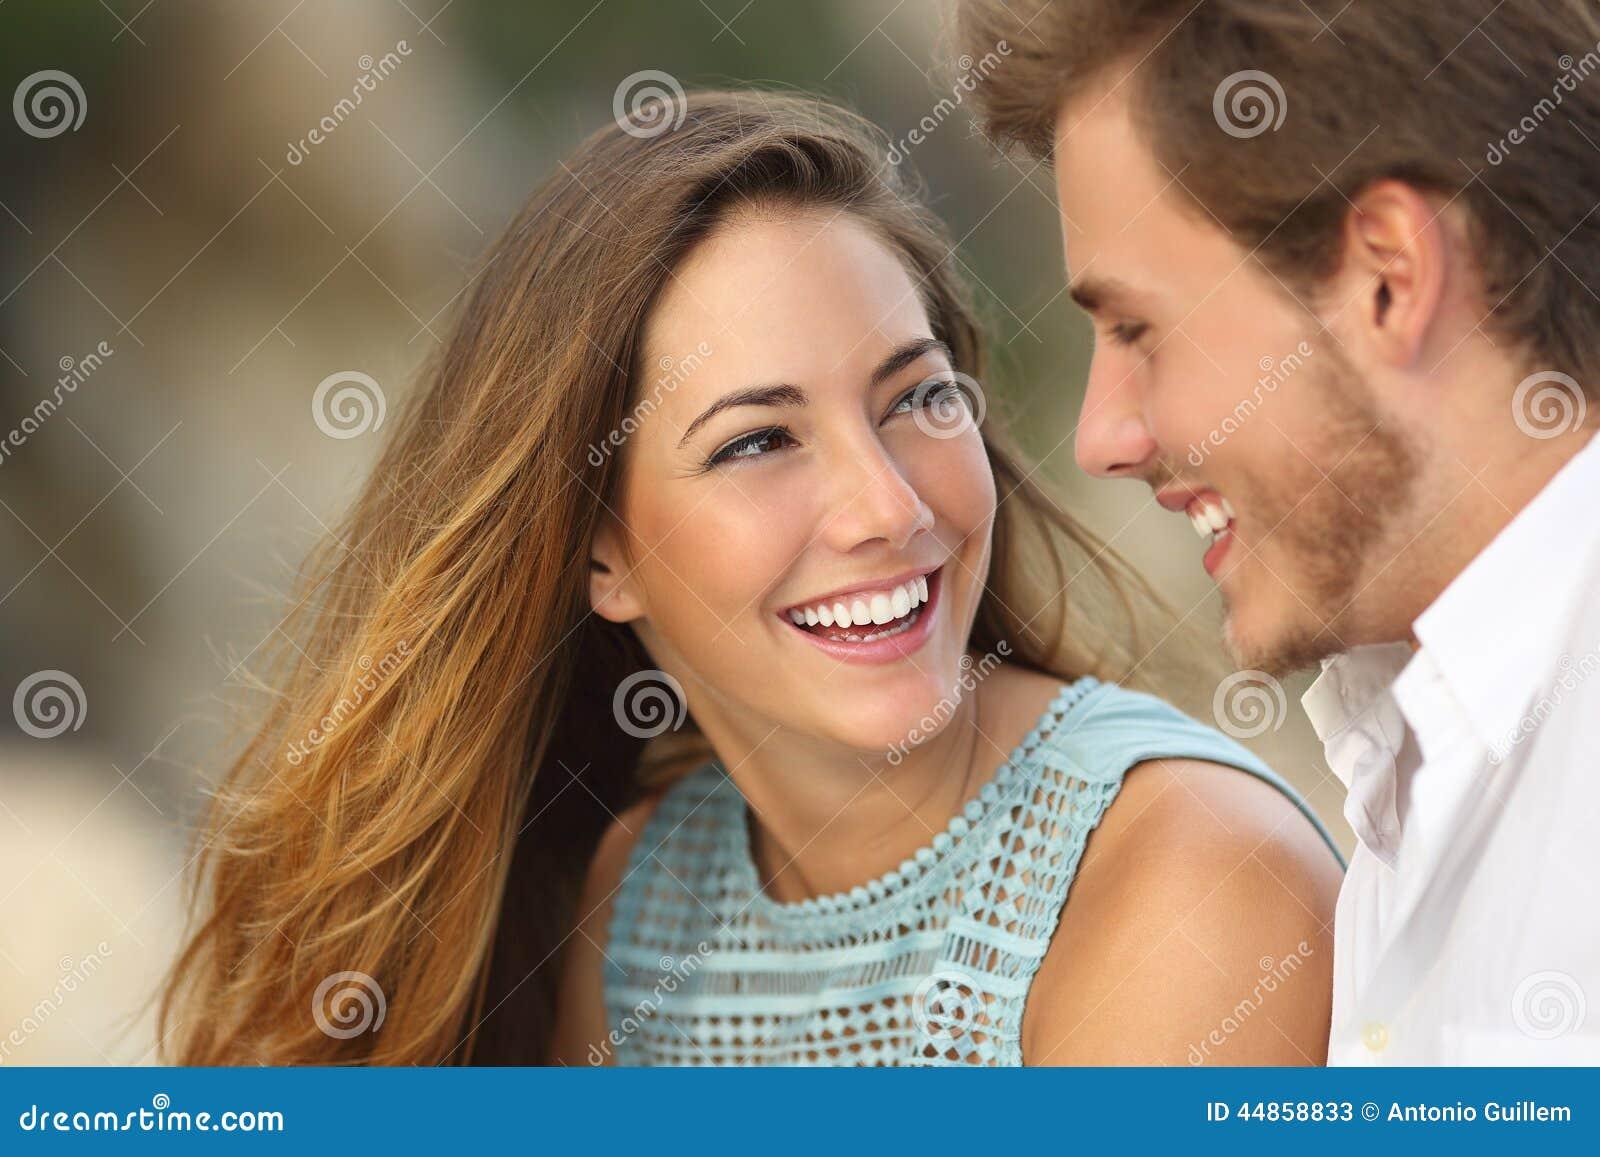 Grappig paar die met een witte perfecte glimlach lachen